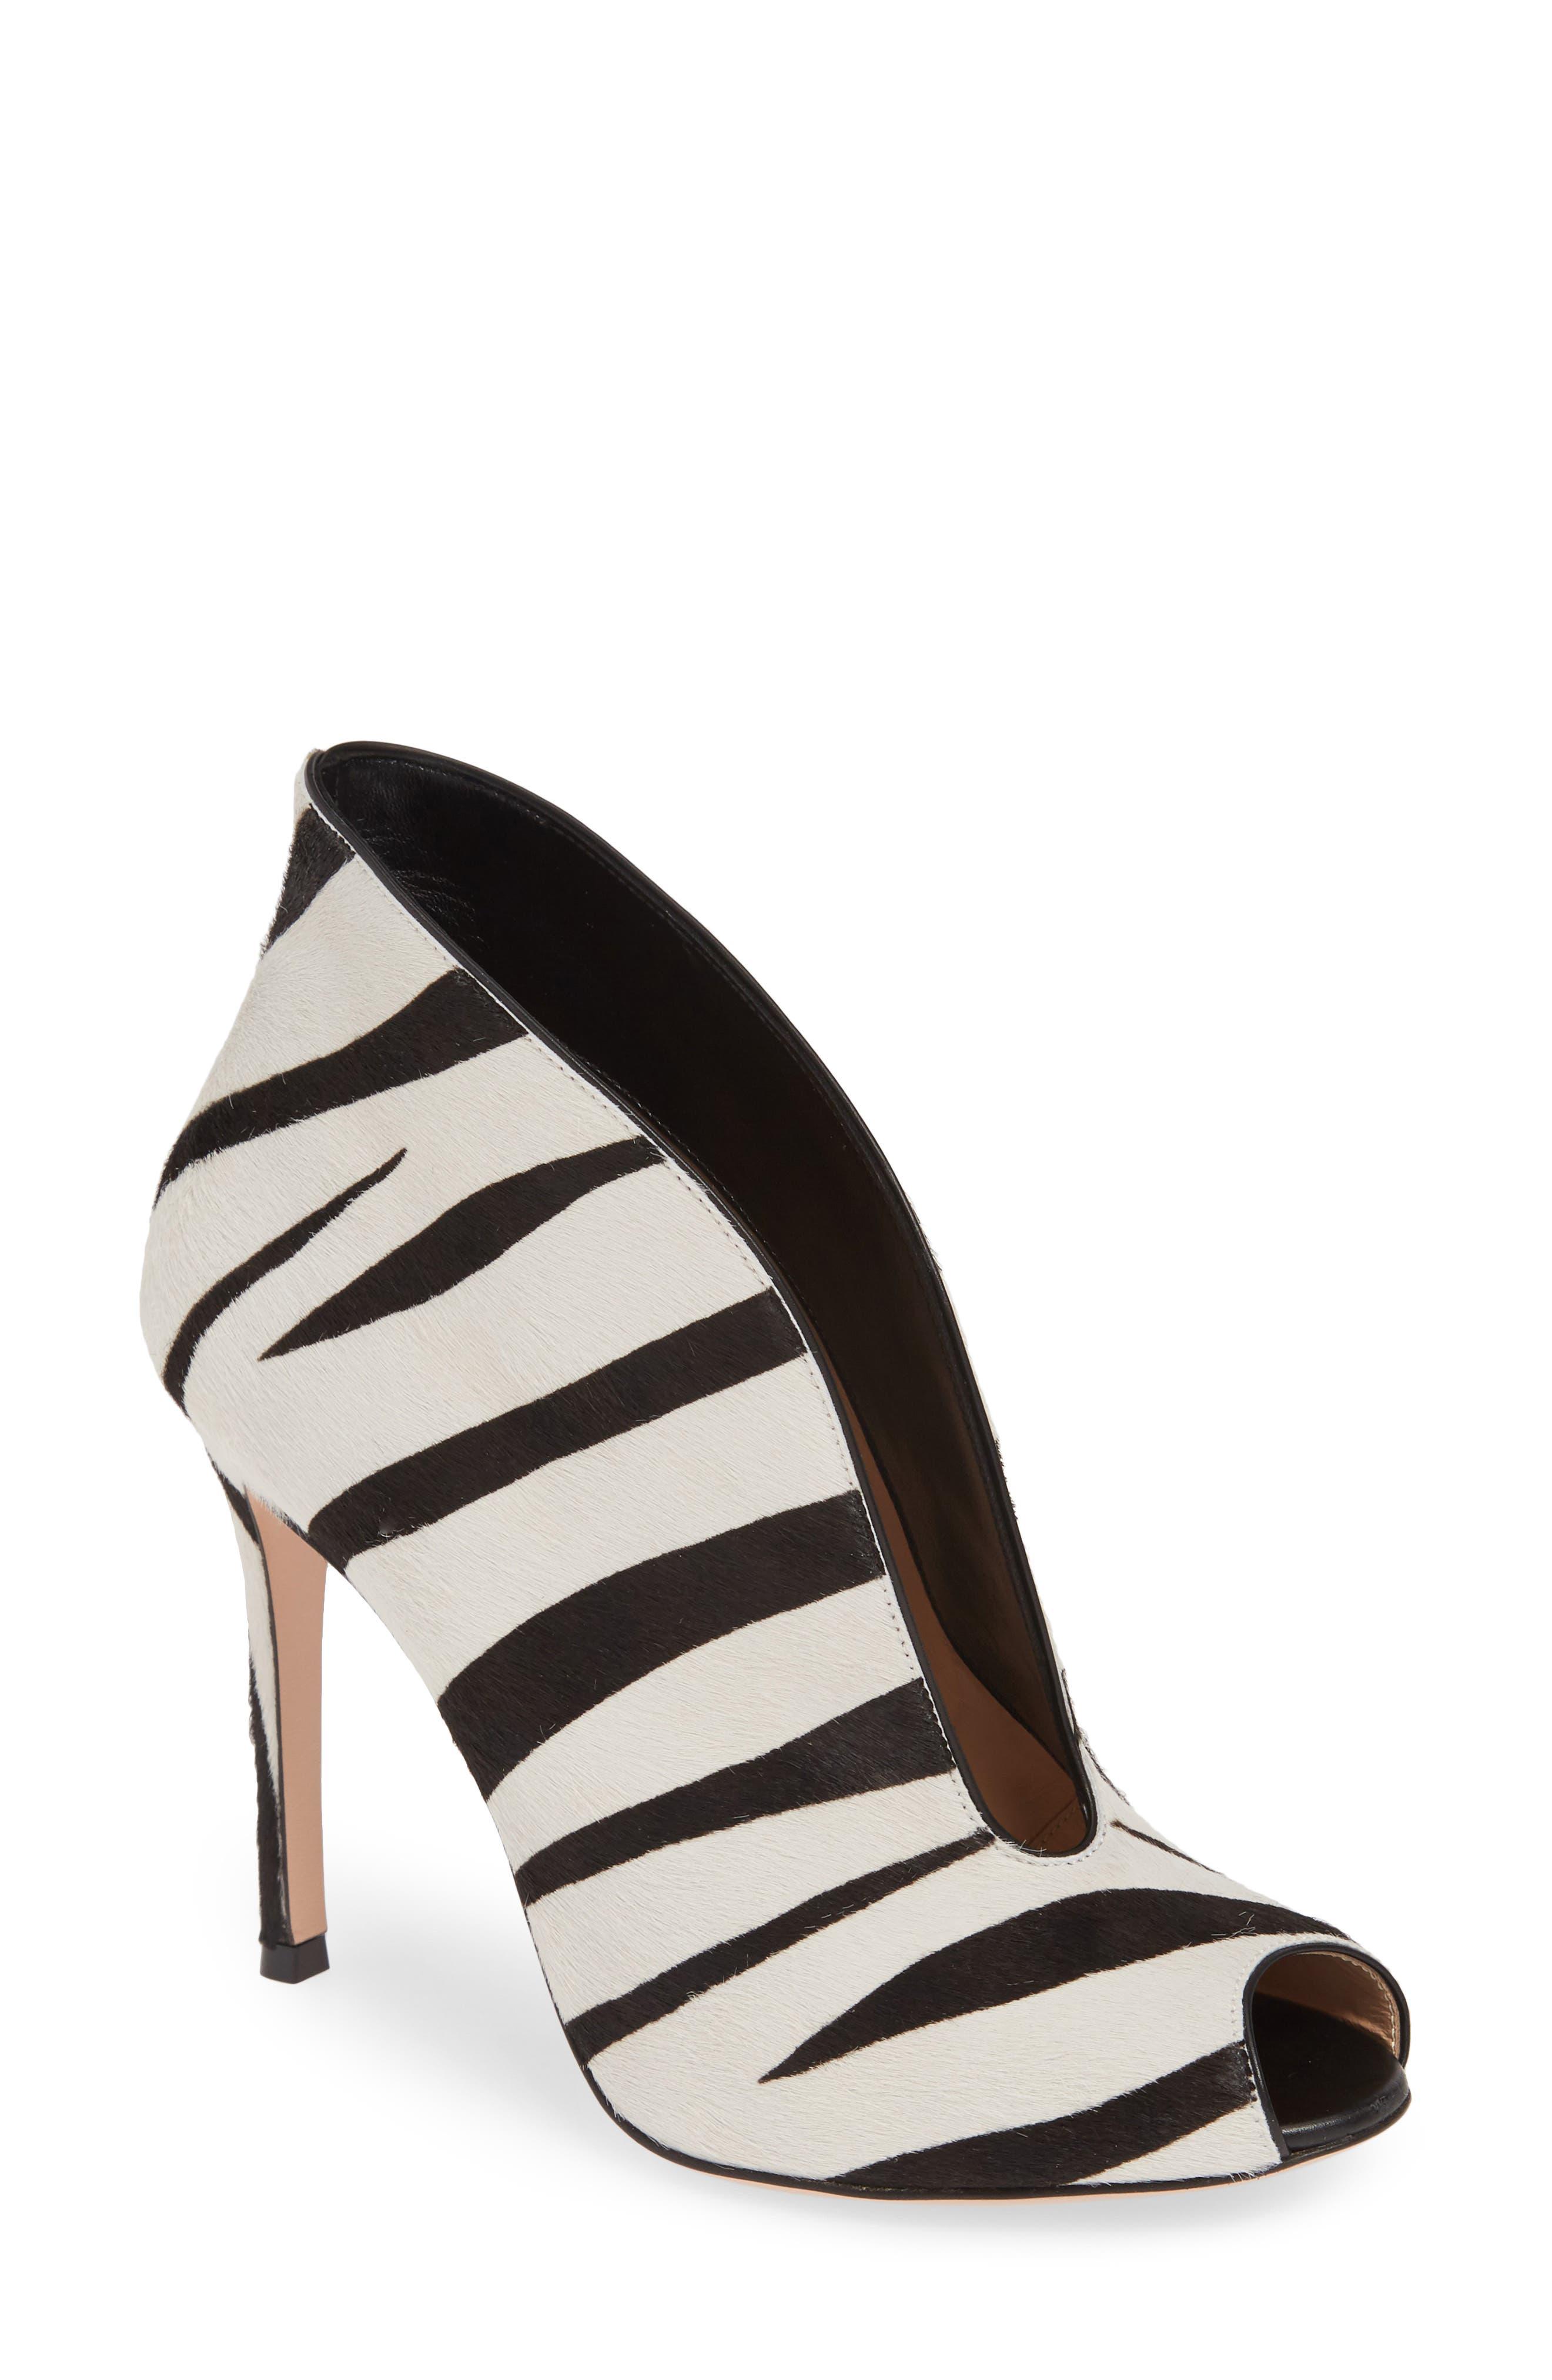 d6e568129de2 Gianvito Rossi Zebra Stripe Genuine Calf Hair Peep Toe Bootie, Black